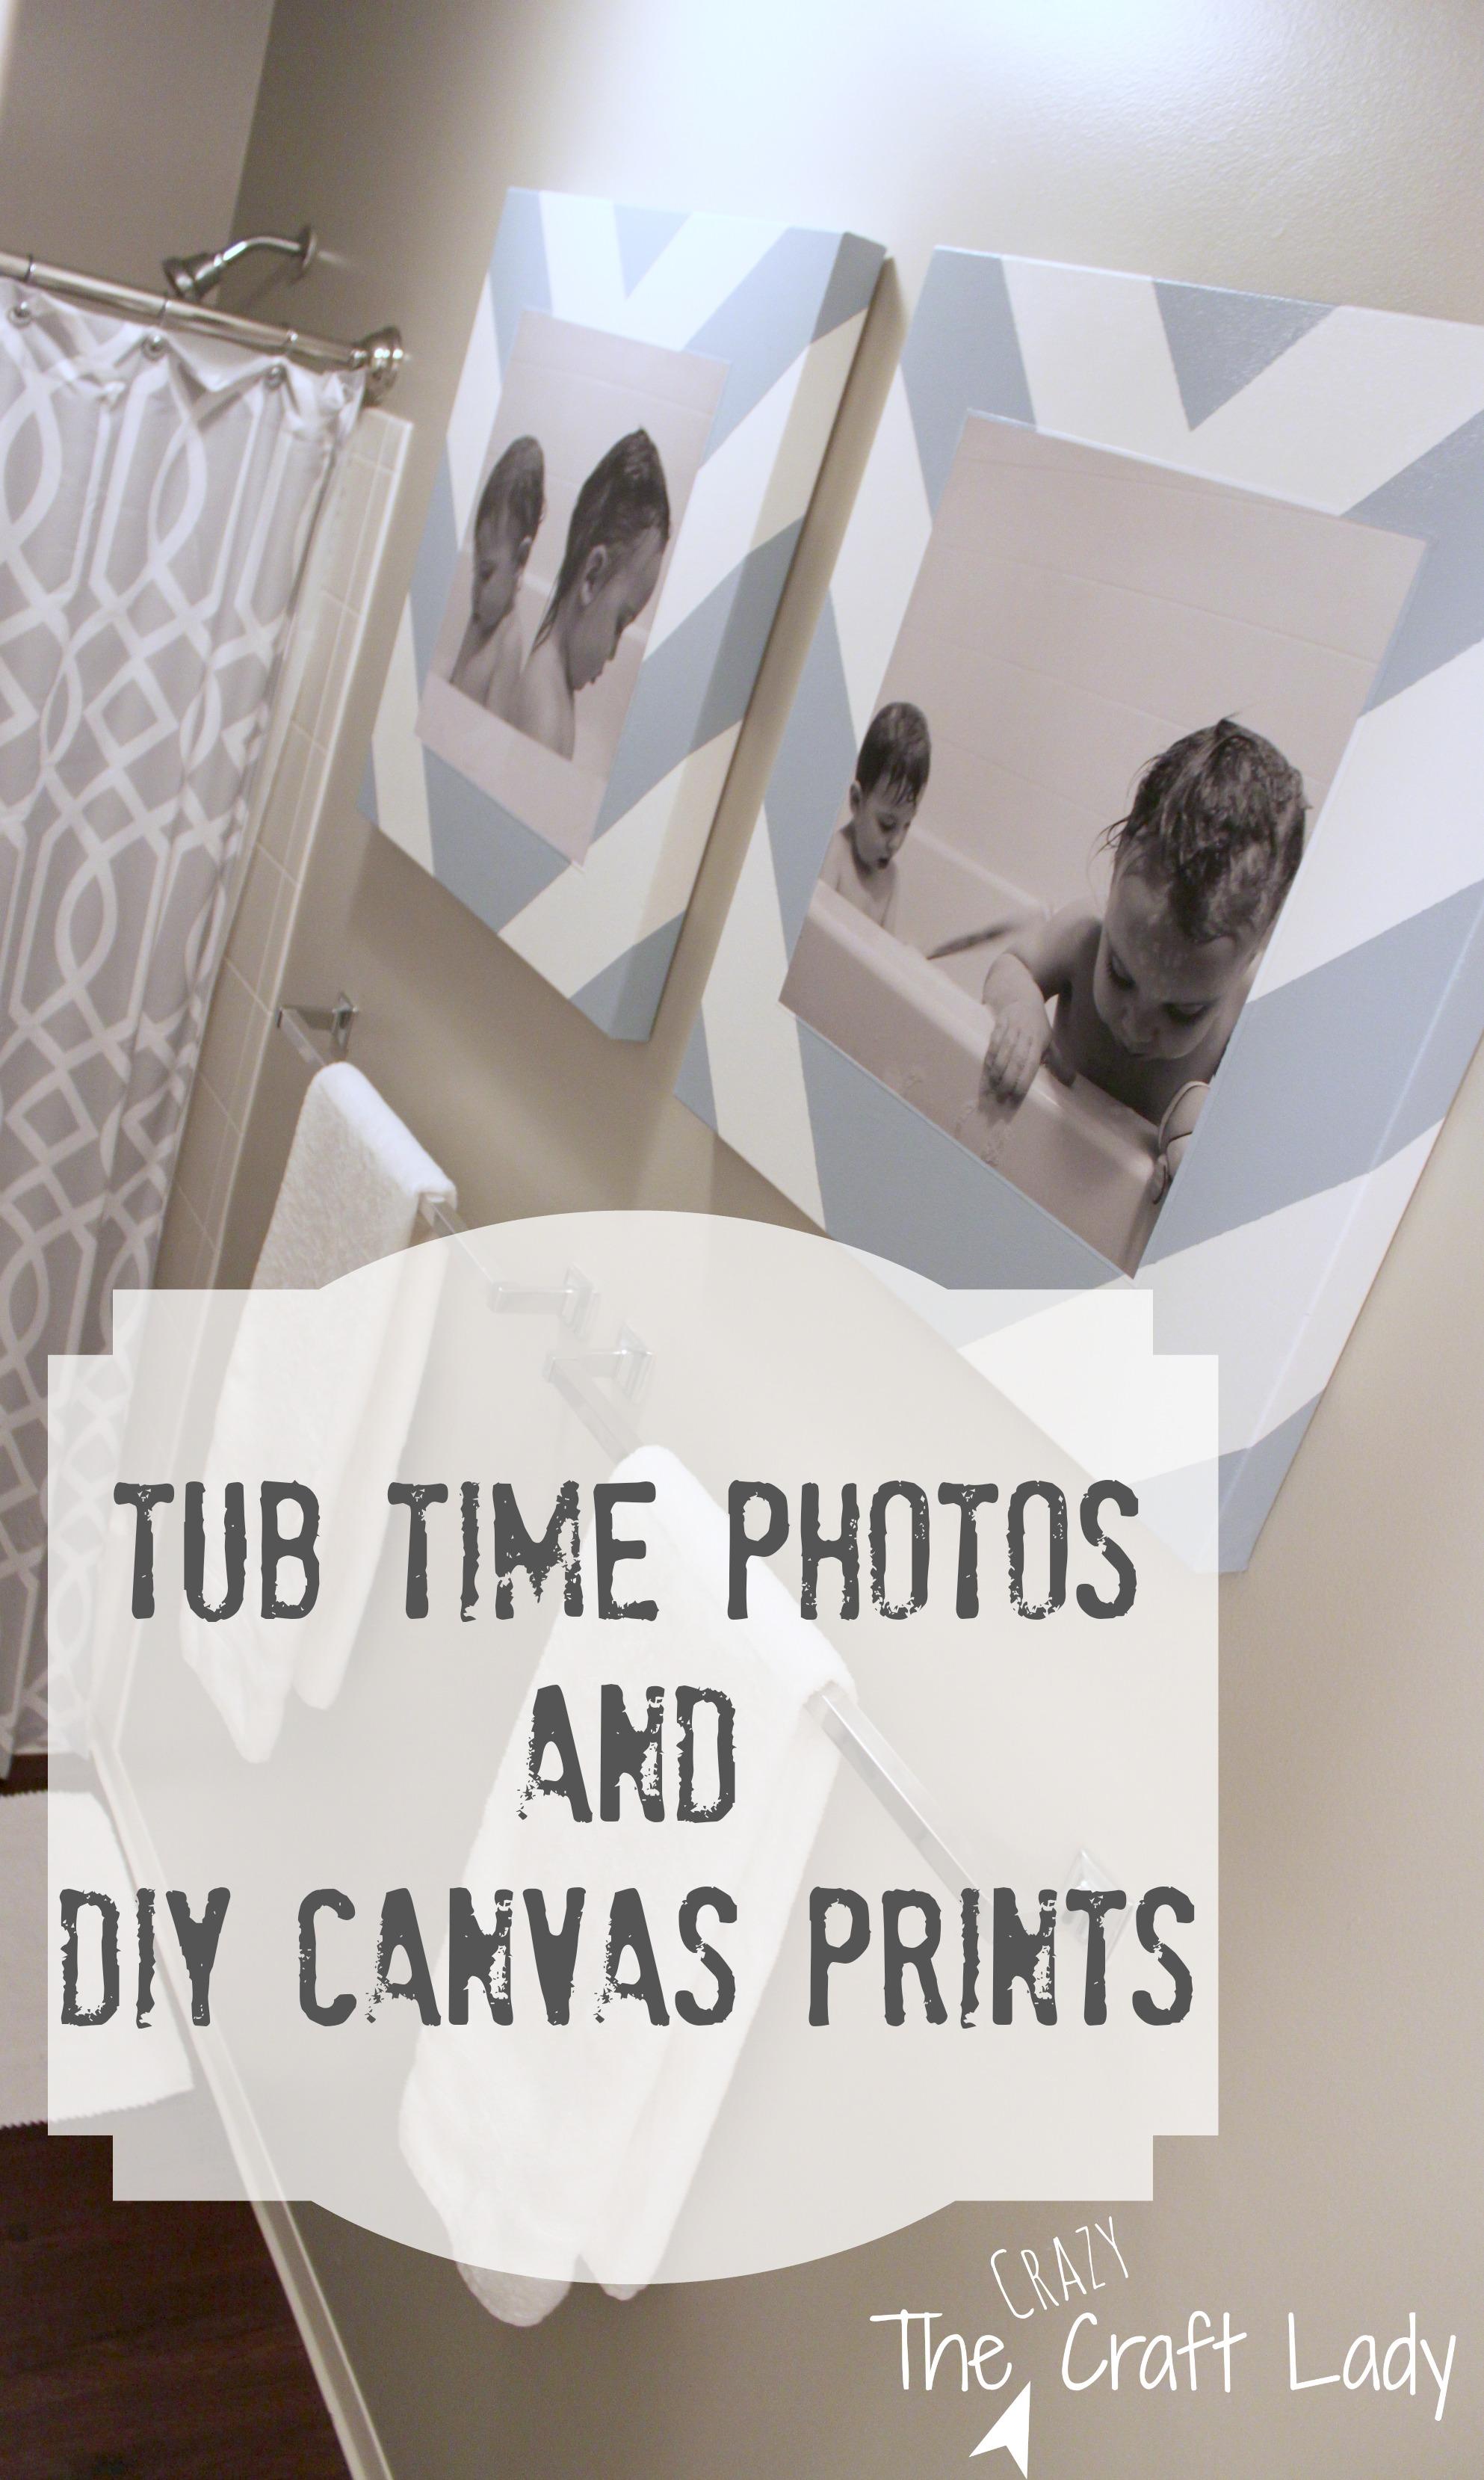 Diy bathroom canvas wall art - Bath Time Photos And Diy Canvas Prints